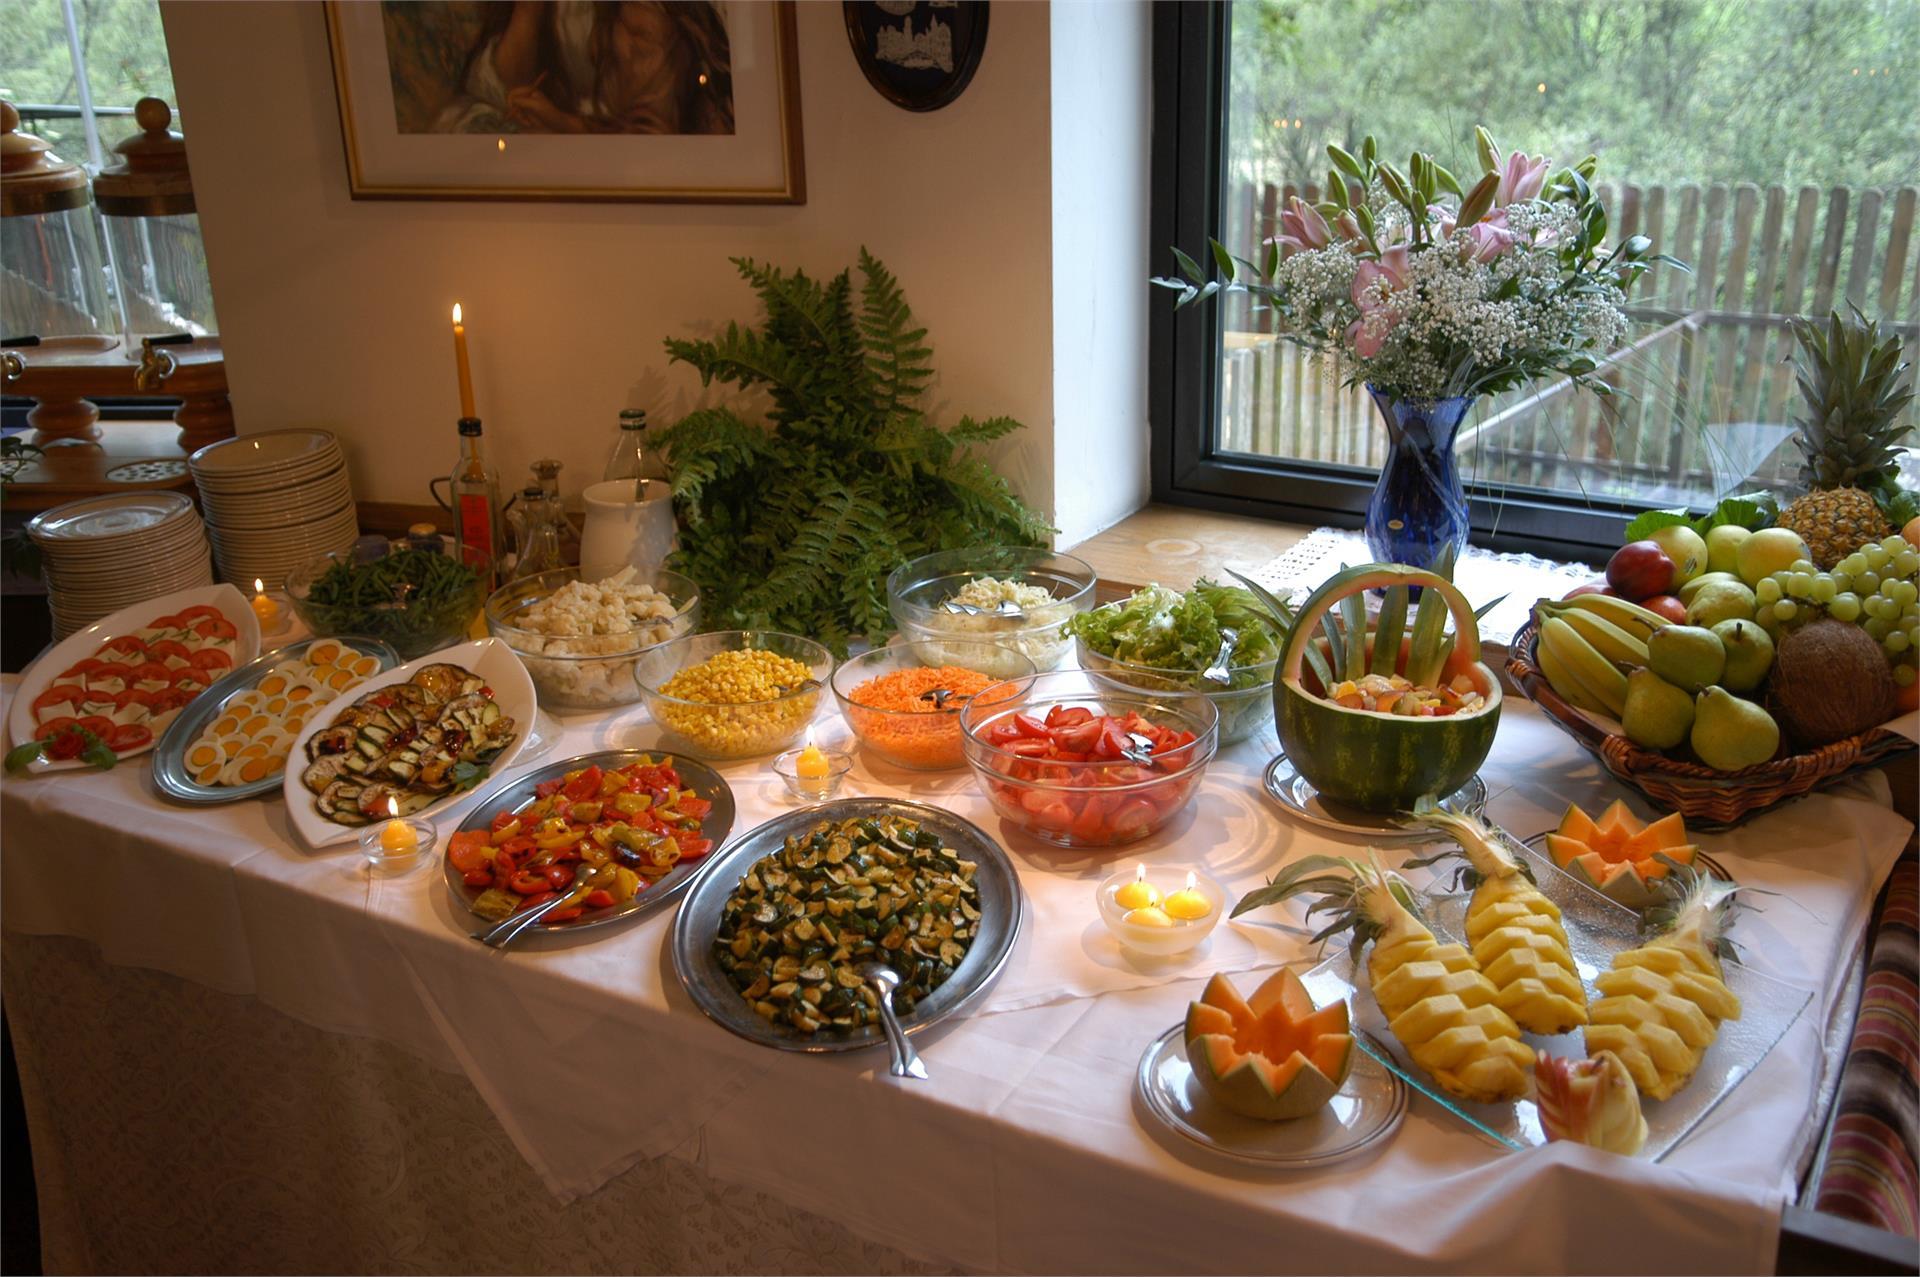 Frisches Salat- und Gemüsebuffet